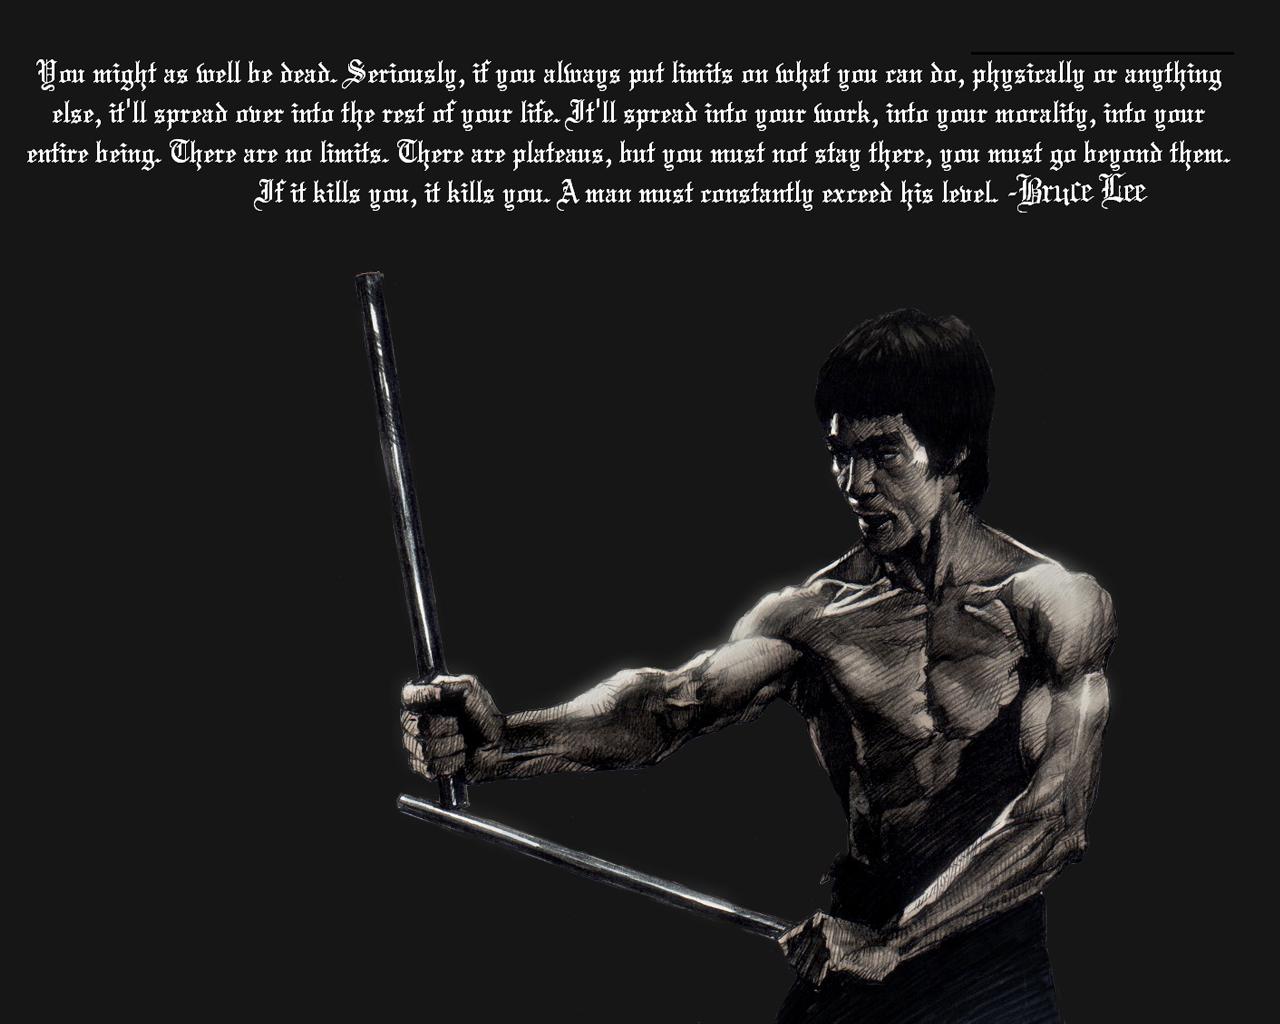 Quotes From Martial Arts Legends Quotesgram